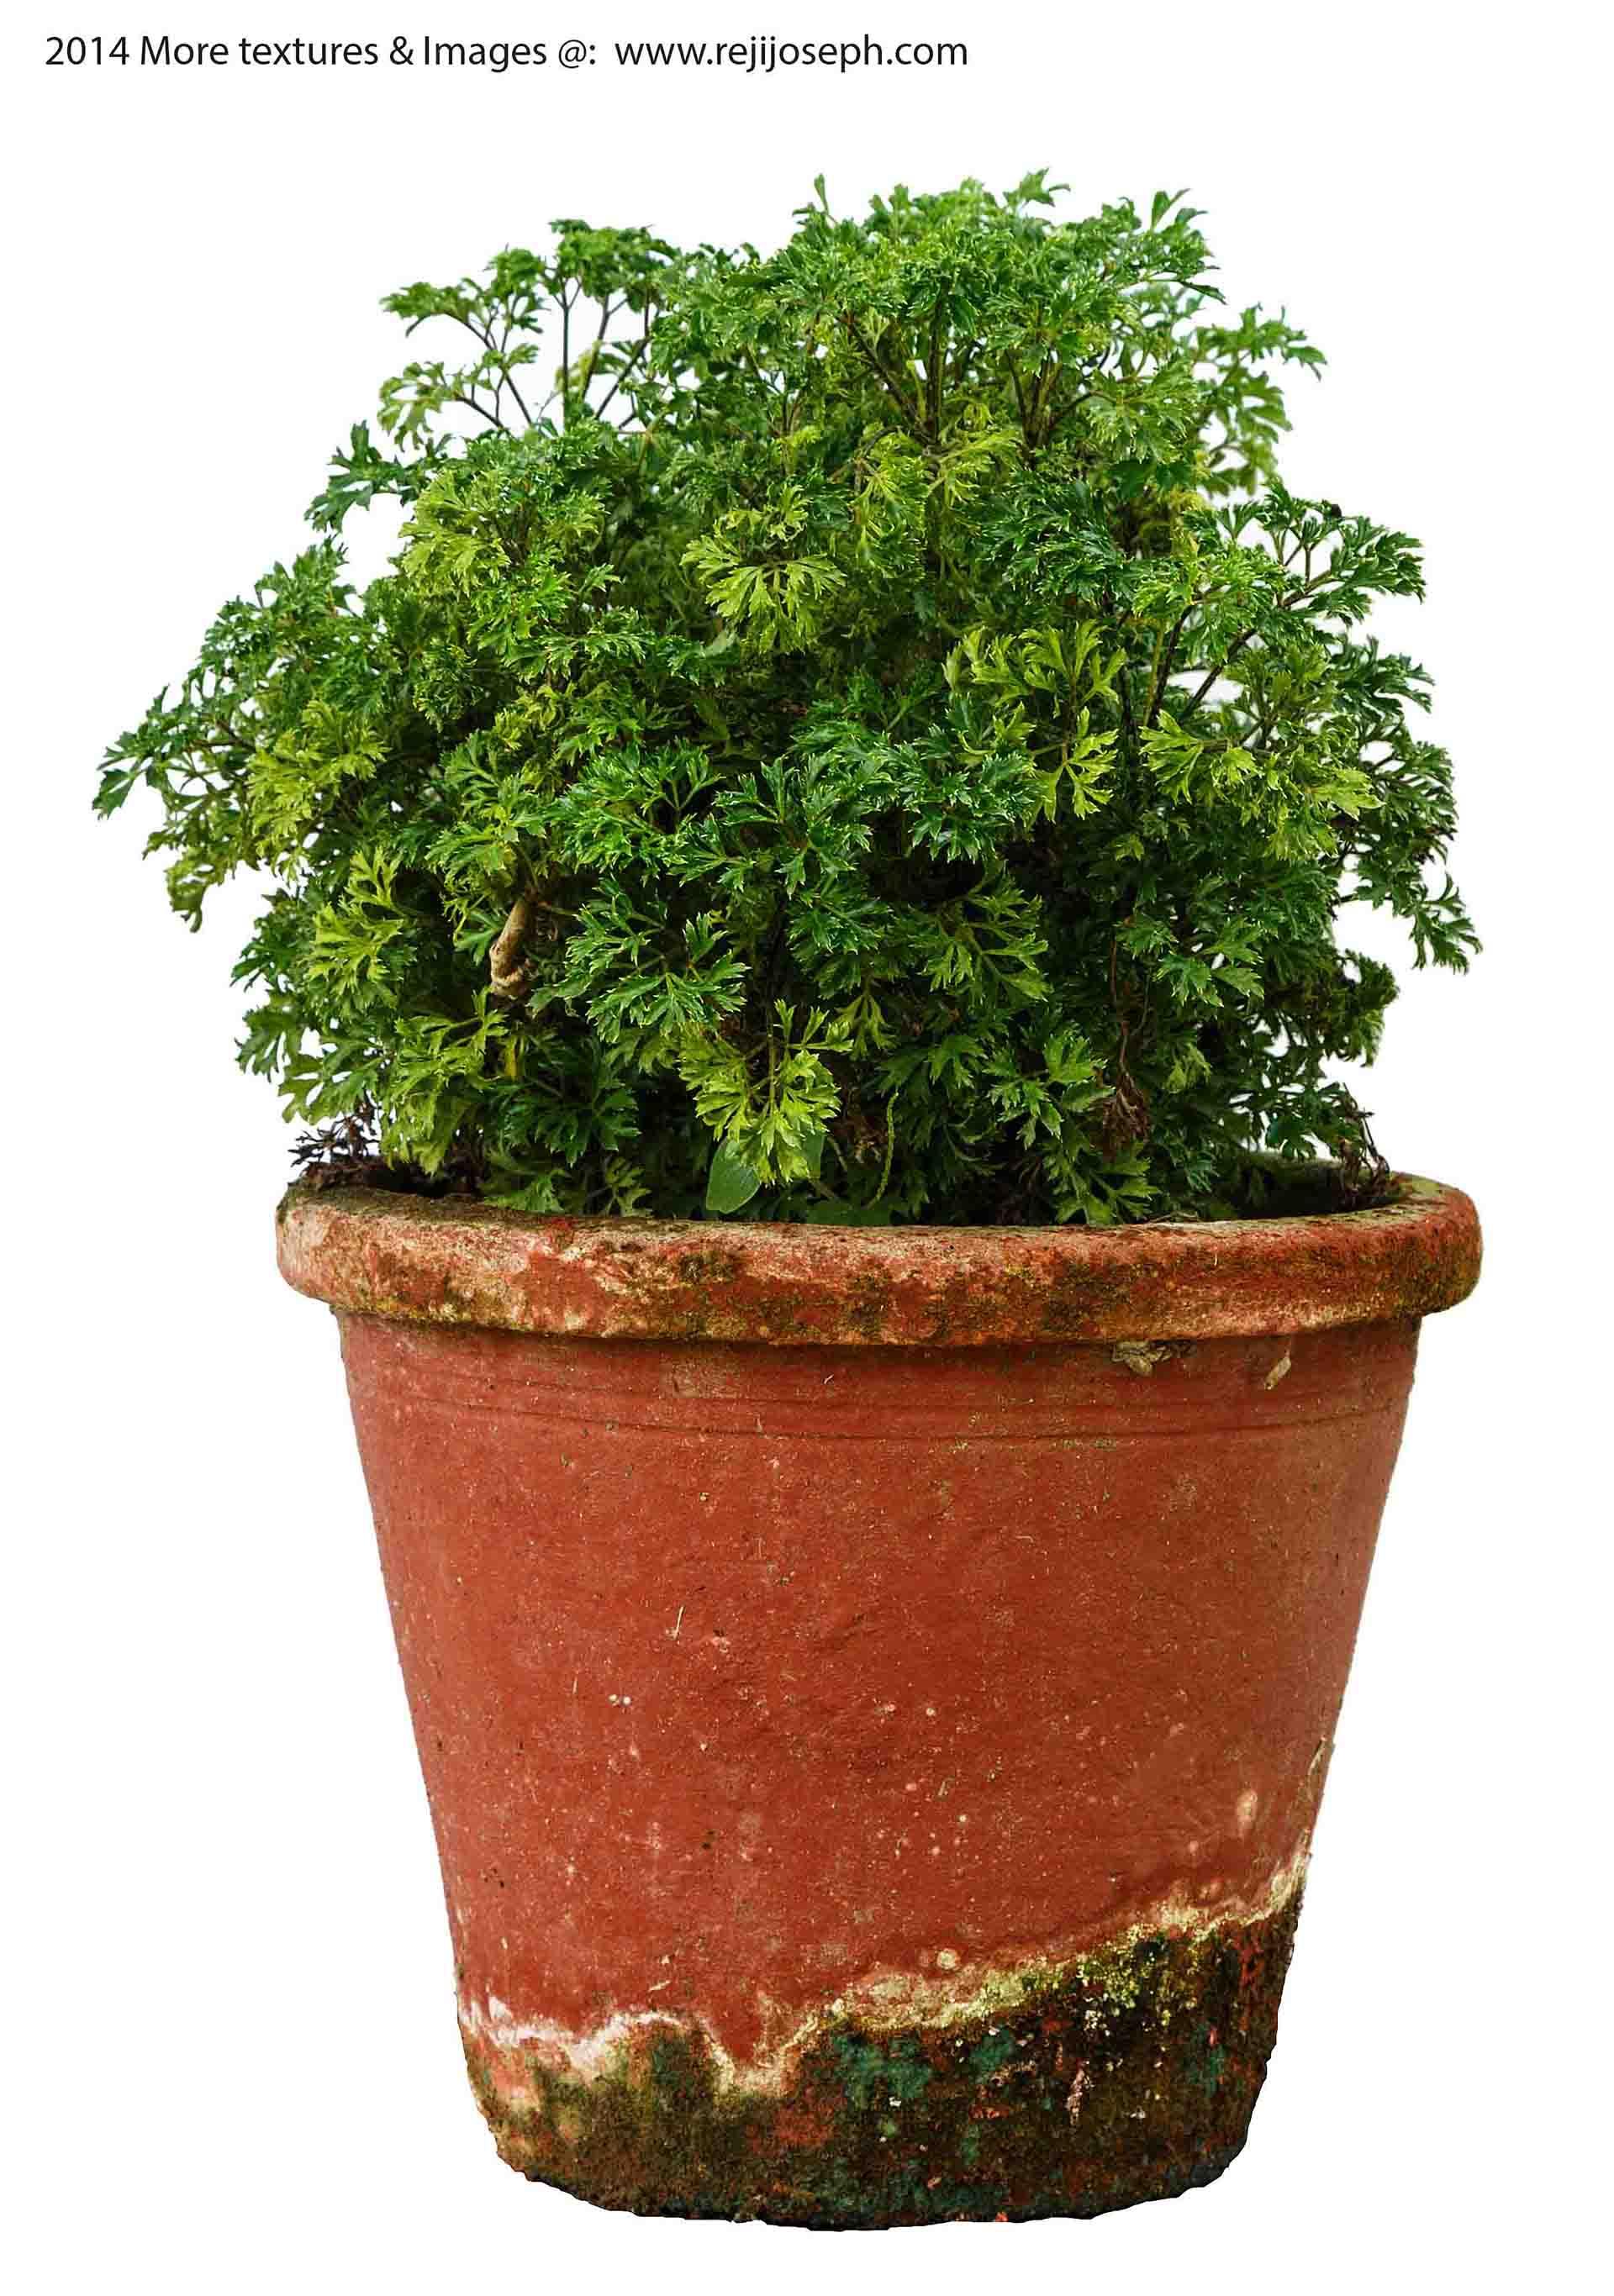 Garden Plant texture 00010